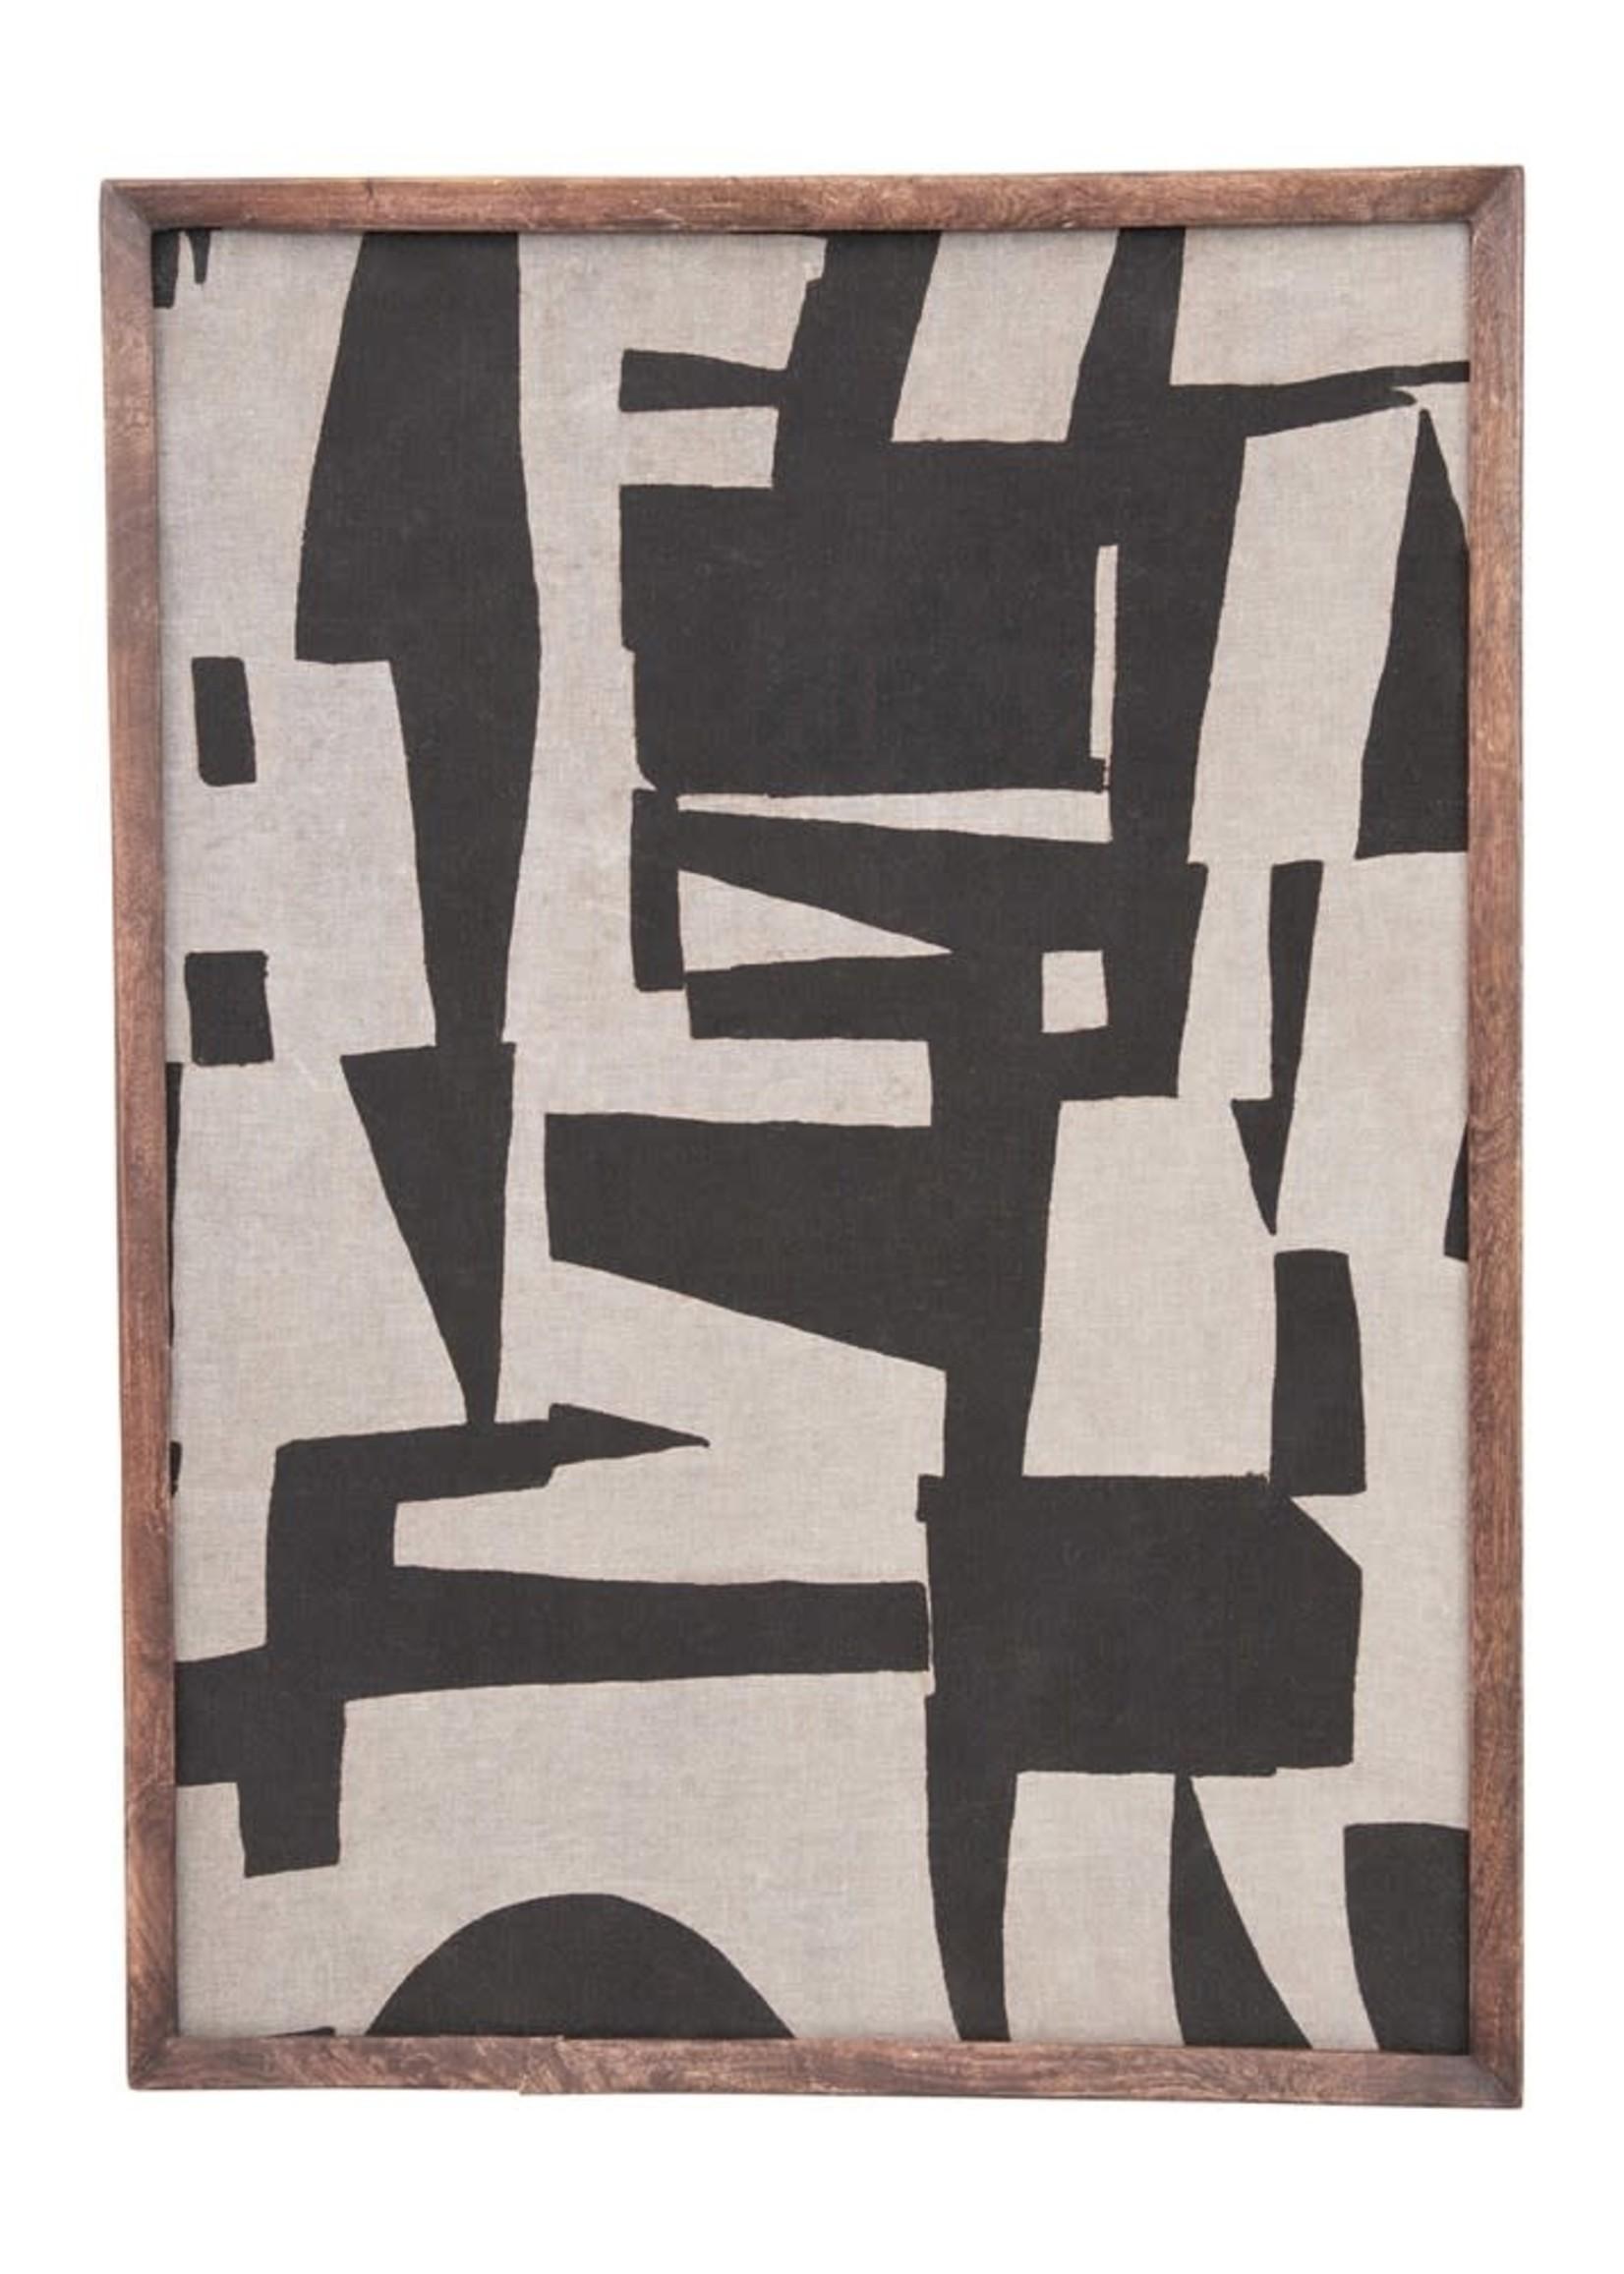 Mango Wood Framed Cotton Fabric Wall Decor w/ Abstract Print, Black & Cream Color